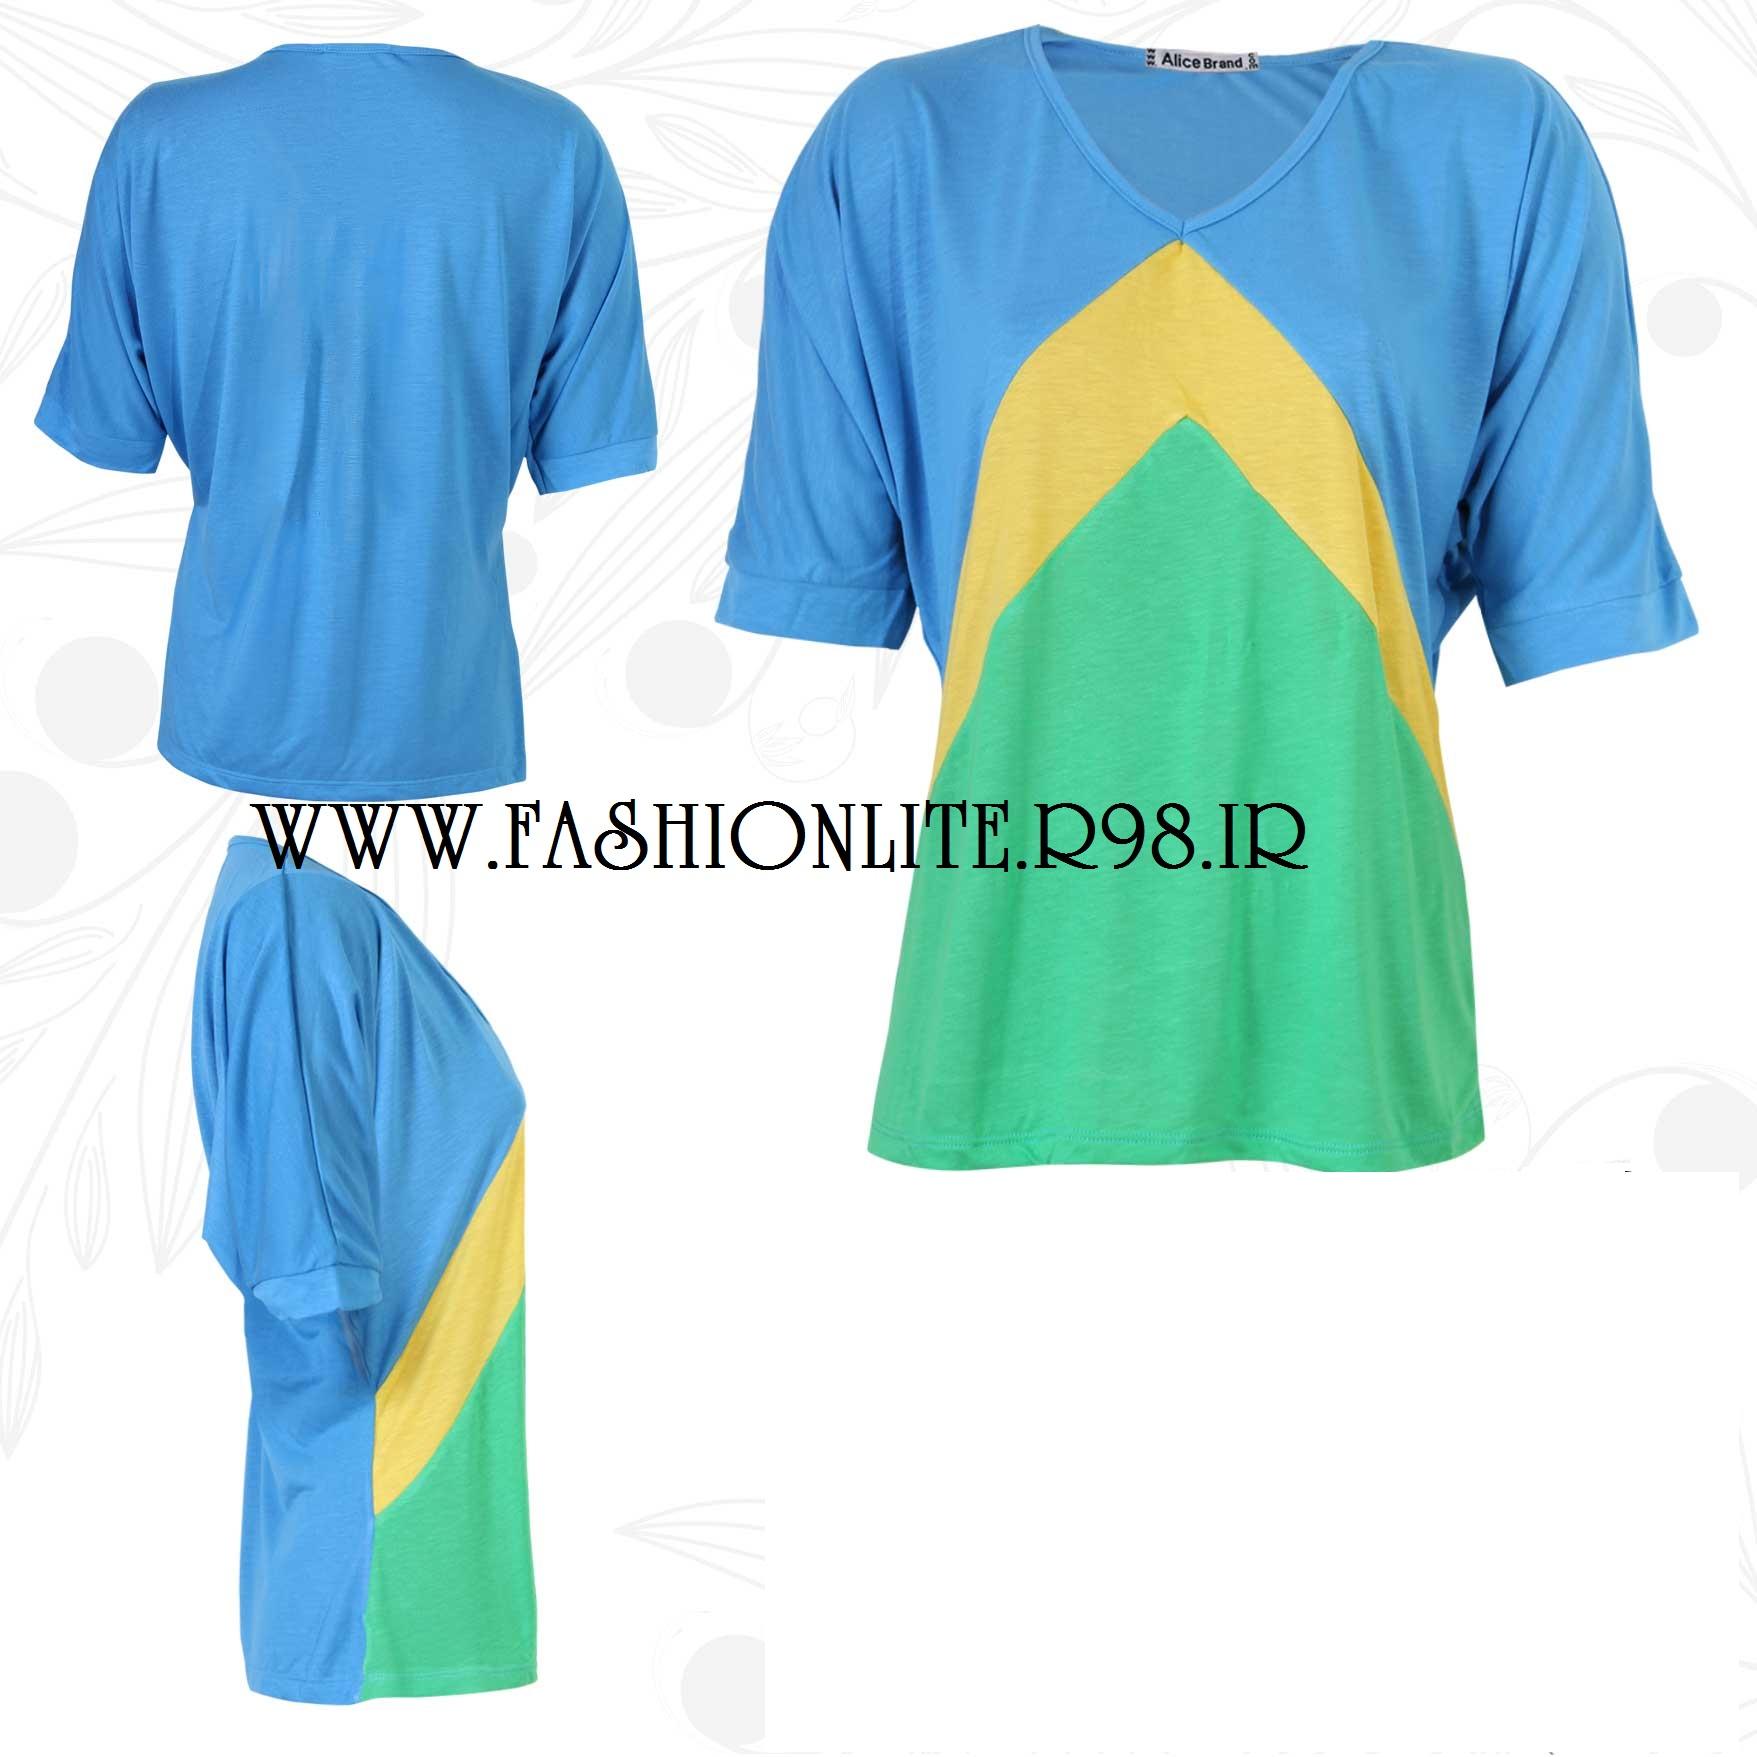 http://rozup.ir/up/fashionlite/mode/R/23_sw.jpg